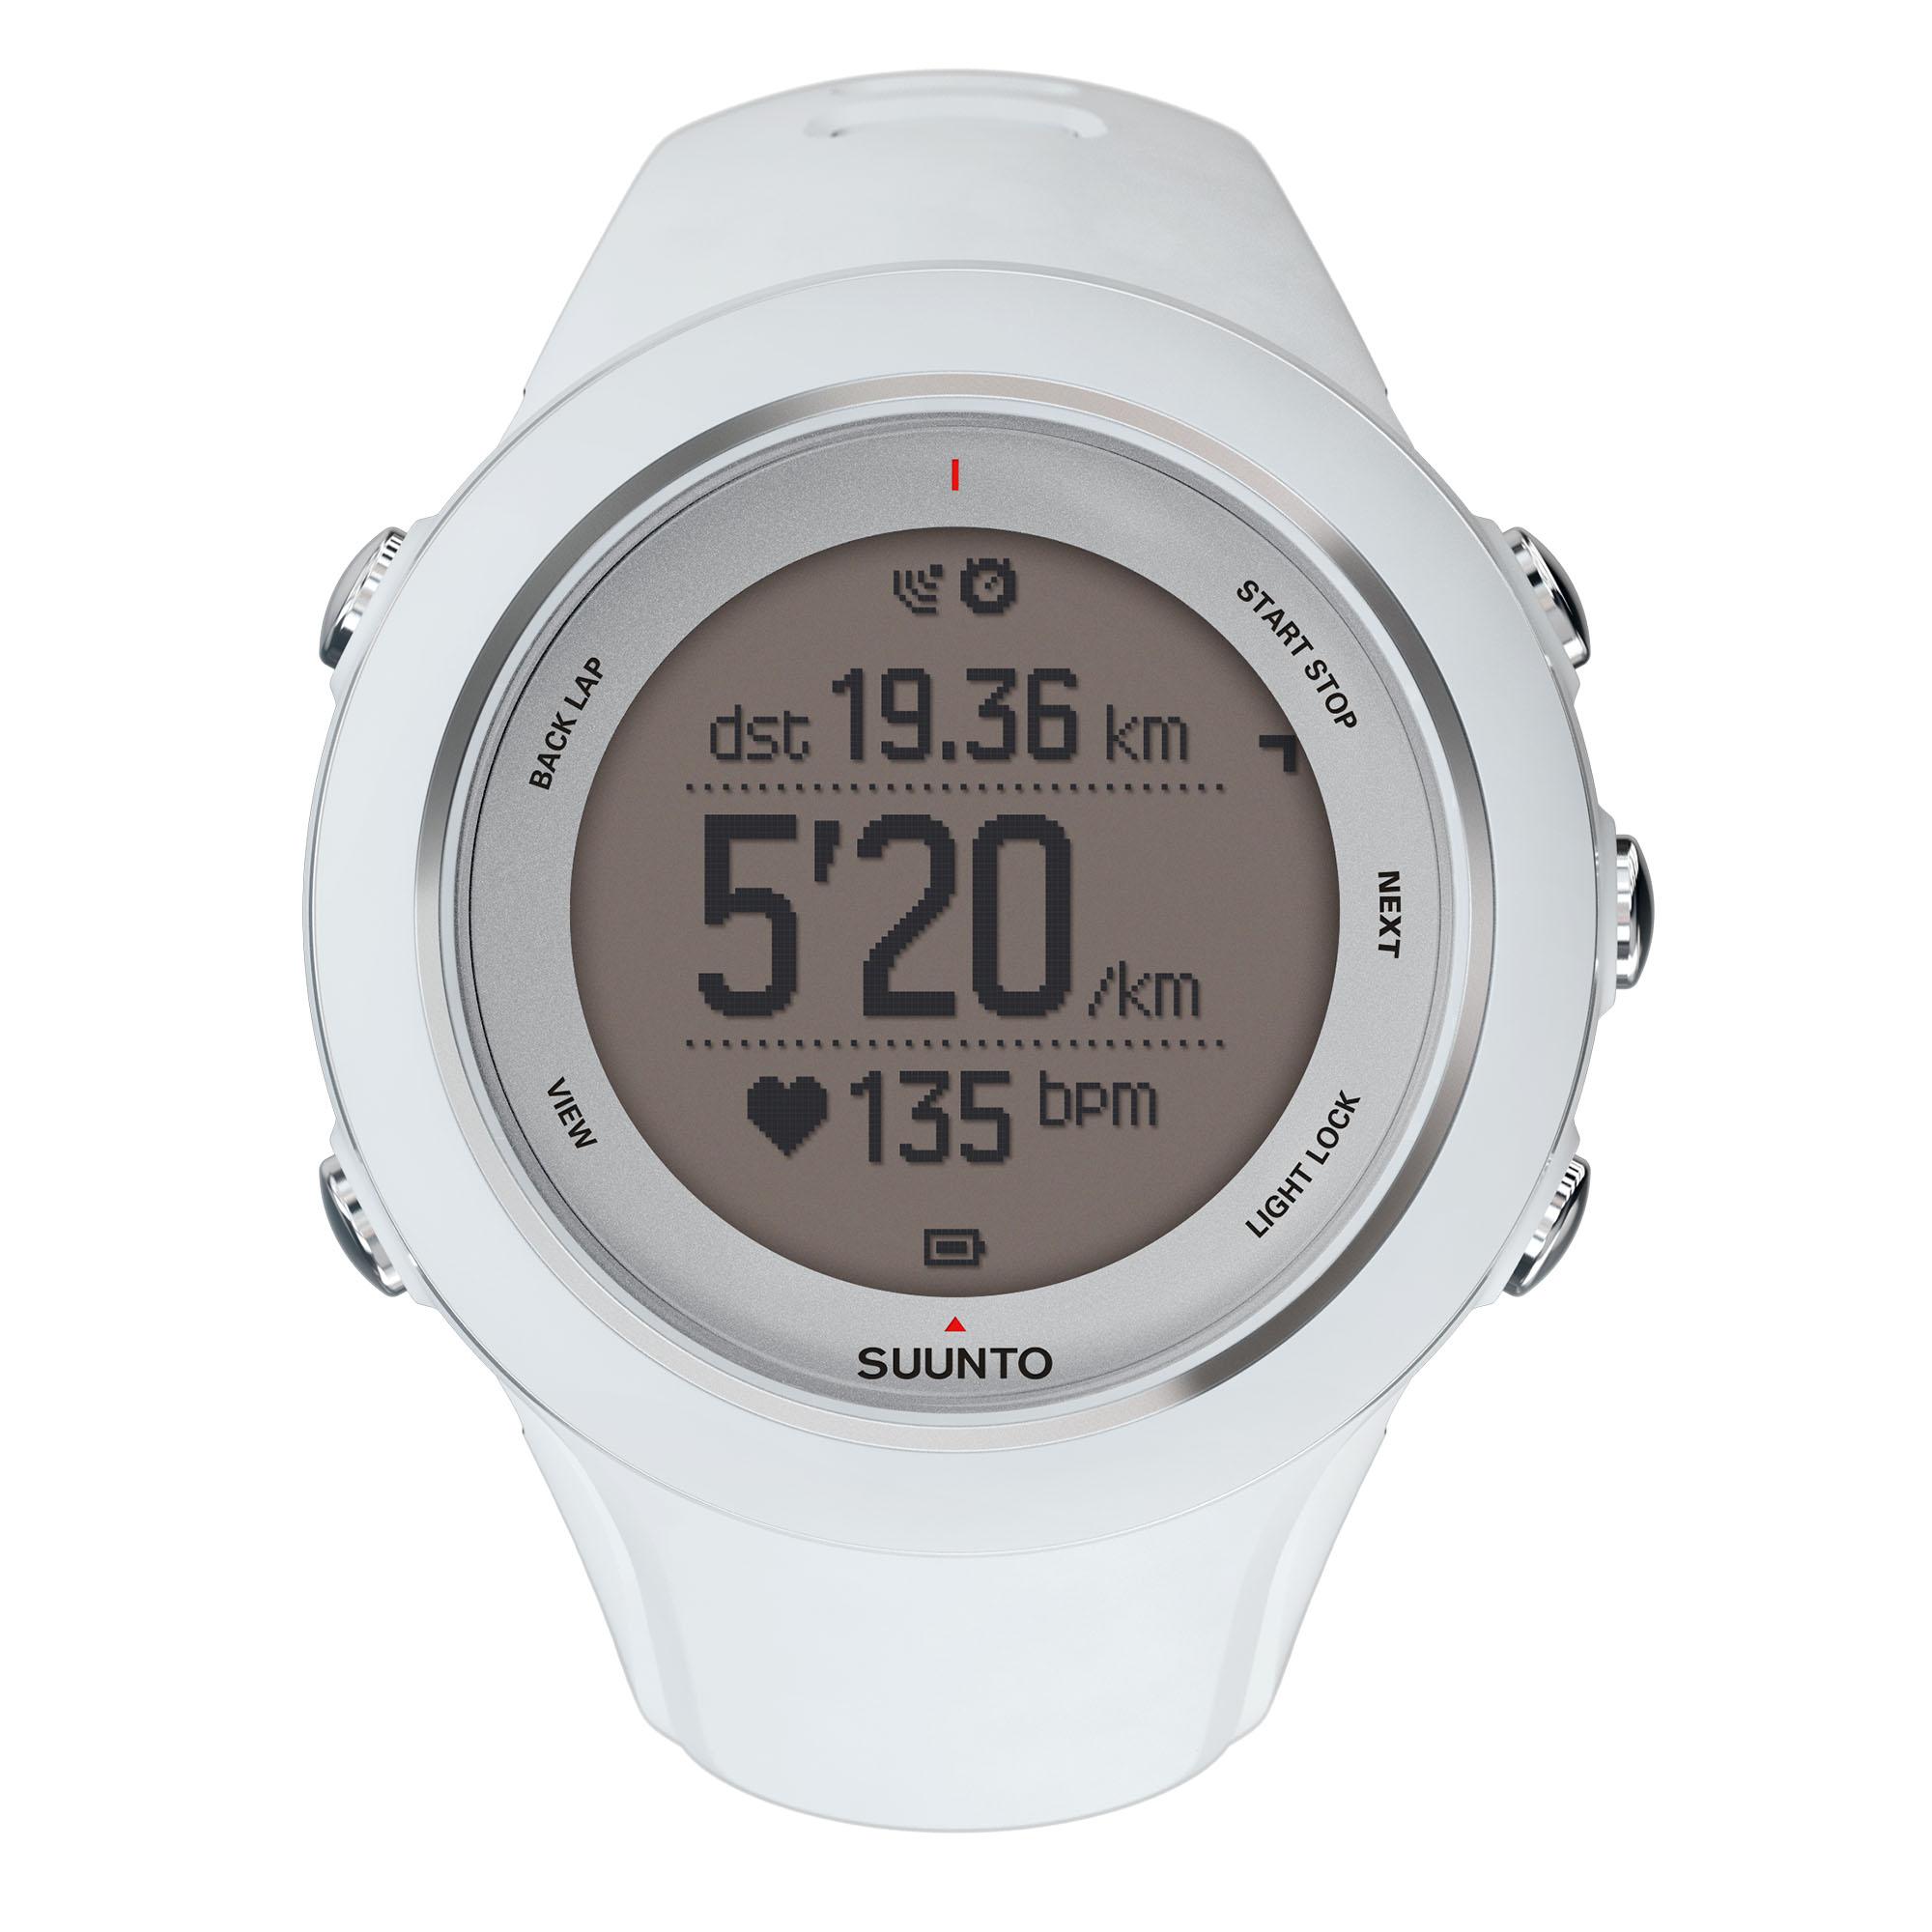 Suunto Ambit3 Sport Sports Watch - White